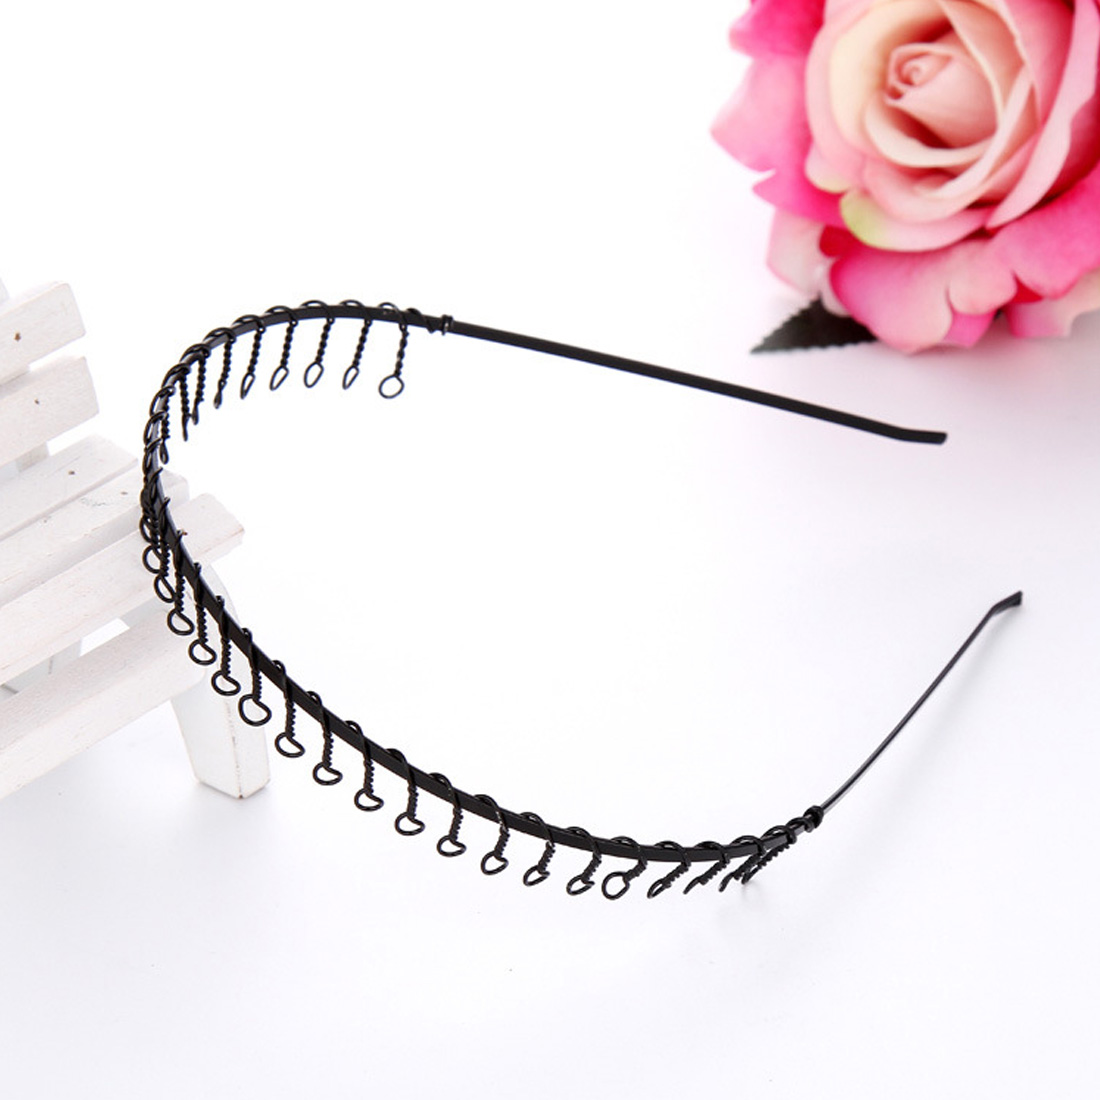 New Fashion Metal Wire Comb Football Sports Alice Band Hair Headband Black high quality